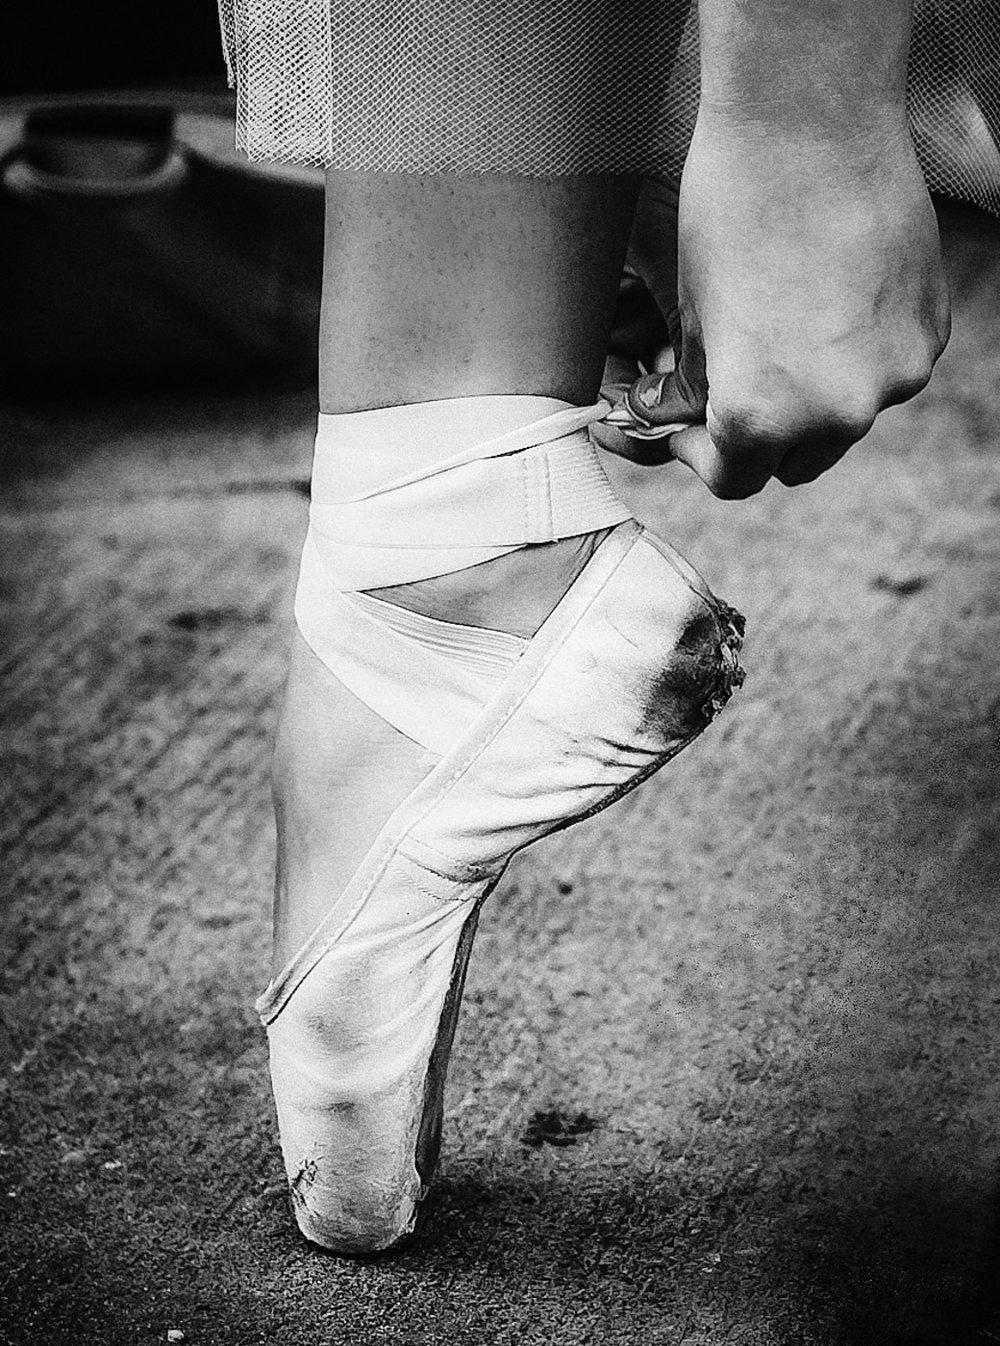 Fujifilmx Portraits Ballet shoe bw (1 of 1).jpg